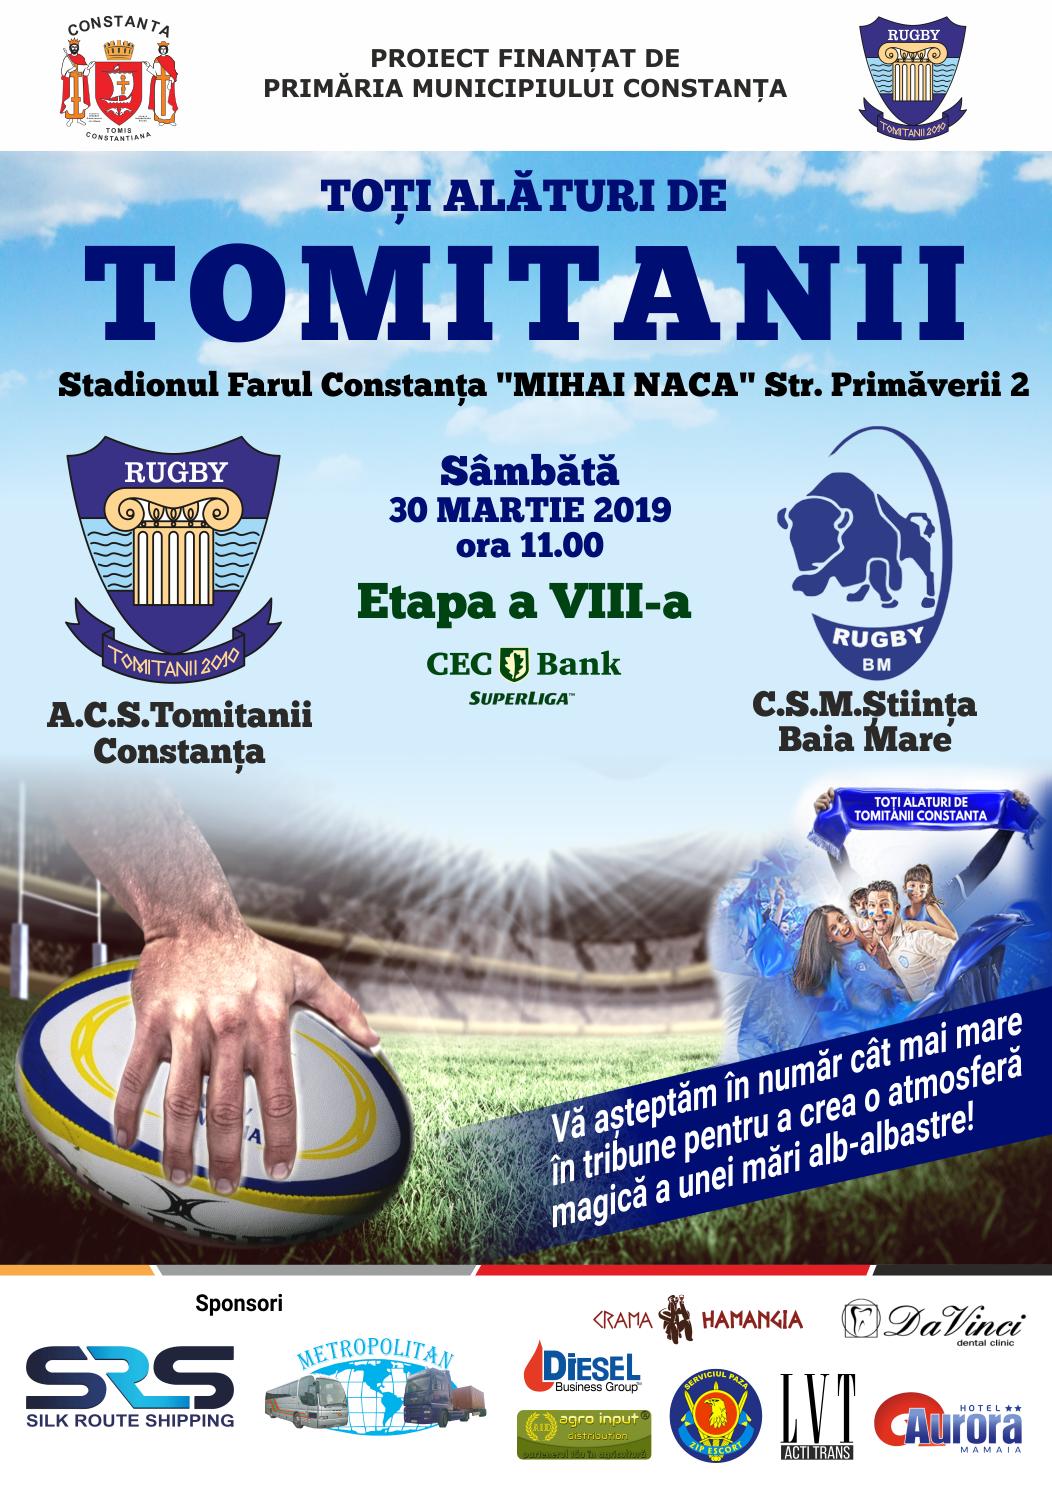 afis A.C.S Tomitanii Constanta vs. C.S.M Stiinta Baia Mare 30.03.2019